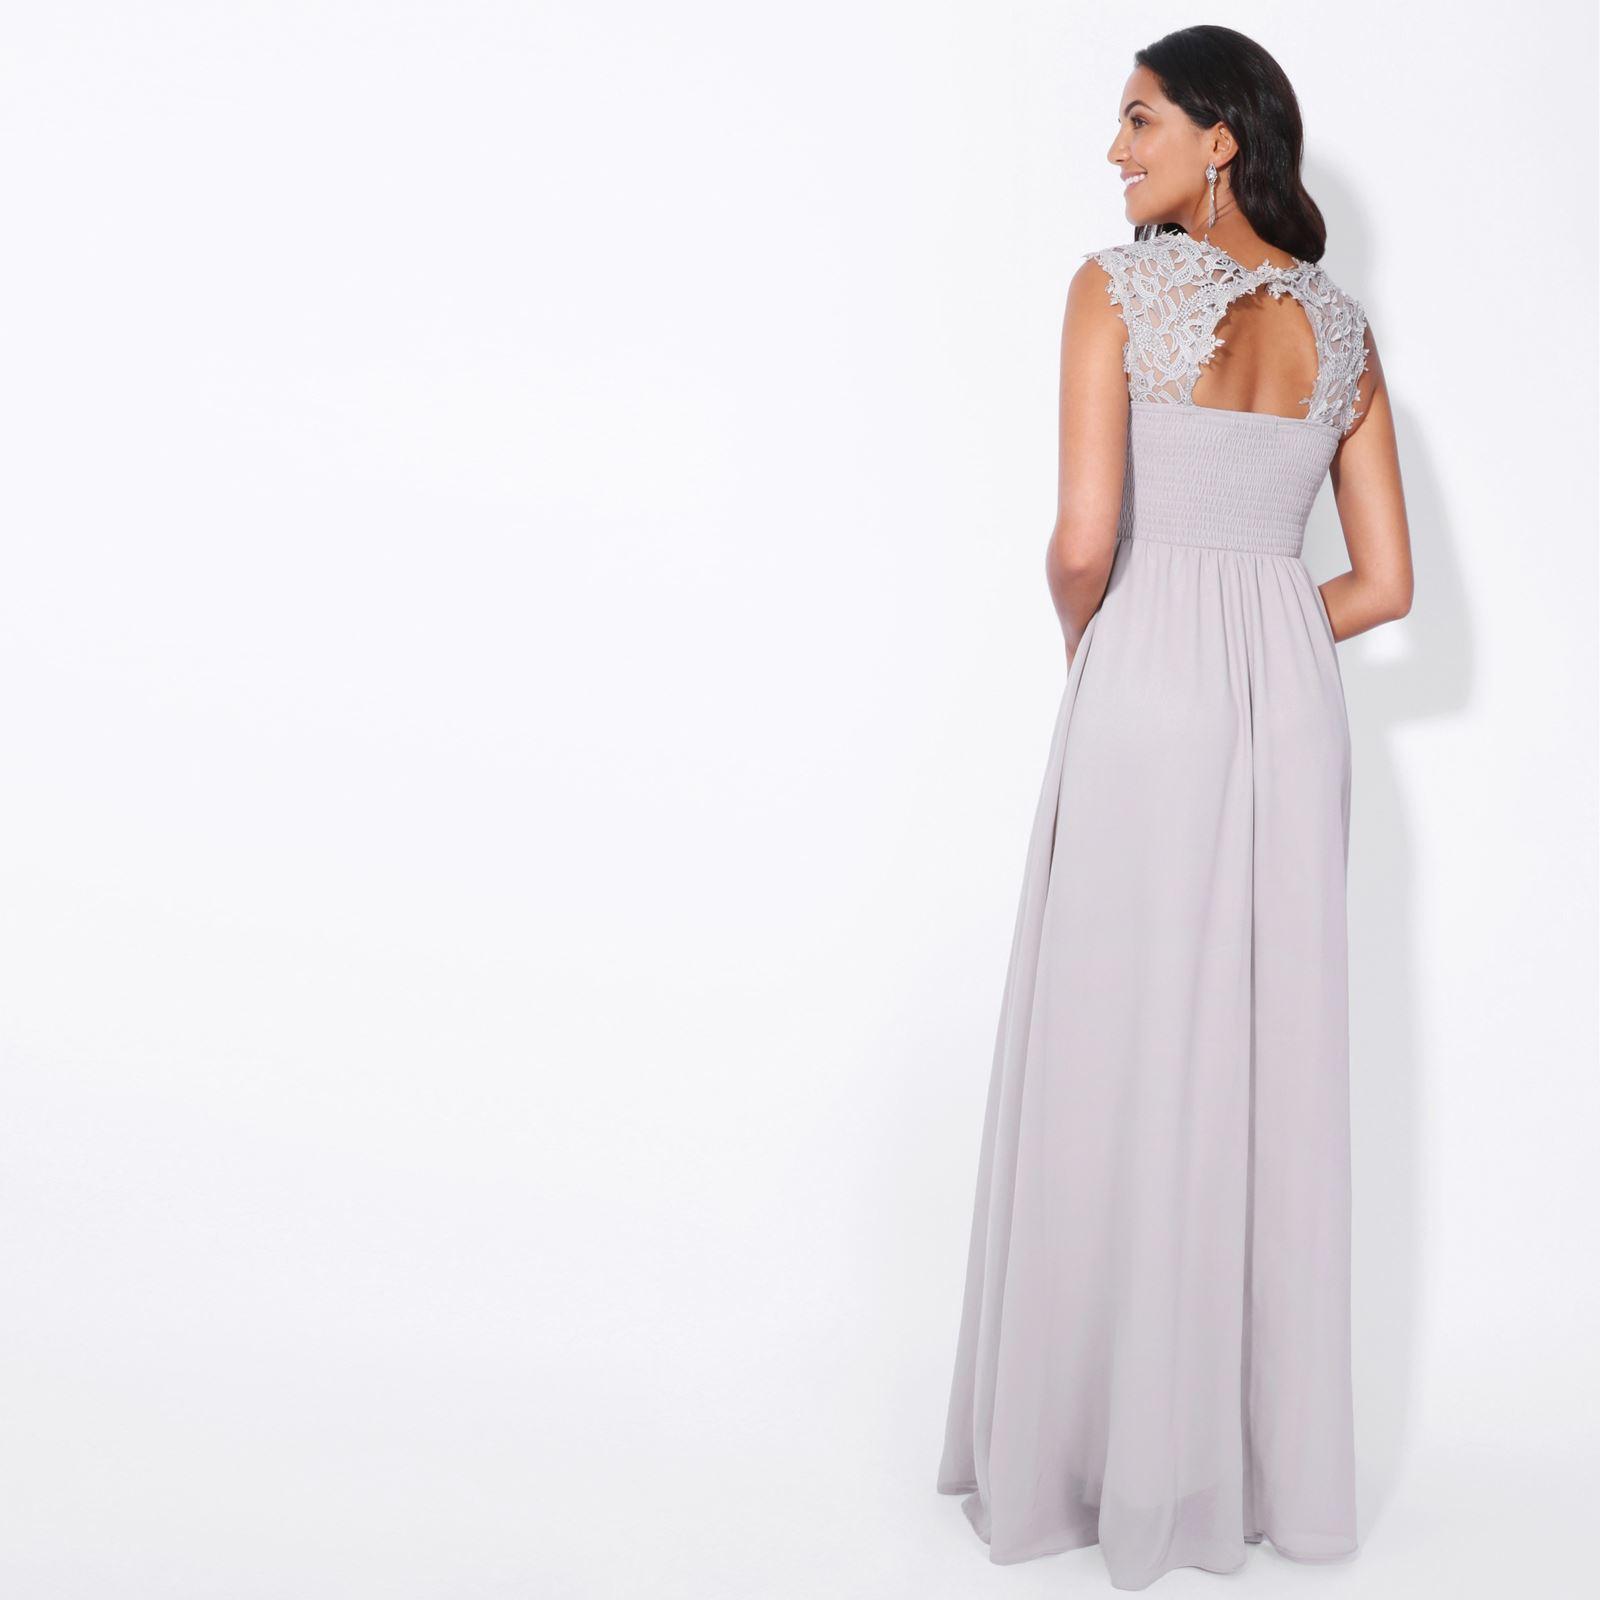 Womens-Wedding-Bridesmaid-Prom-Dress-Formal-One-Off-Shoulder-Long-Evening-8-18 thumbnail 27